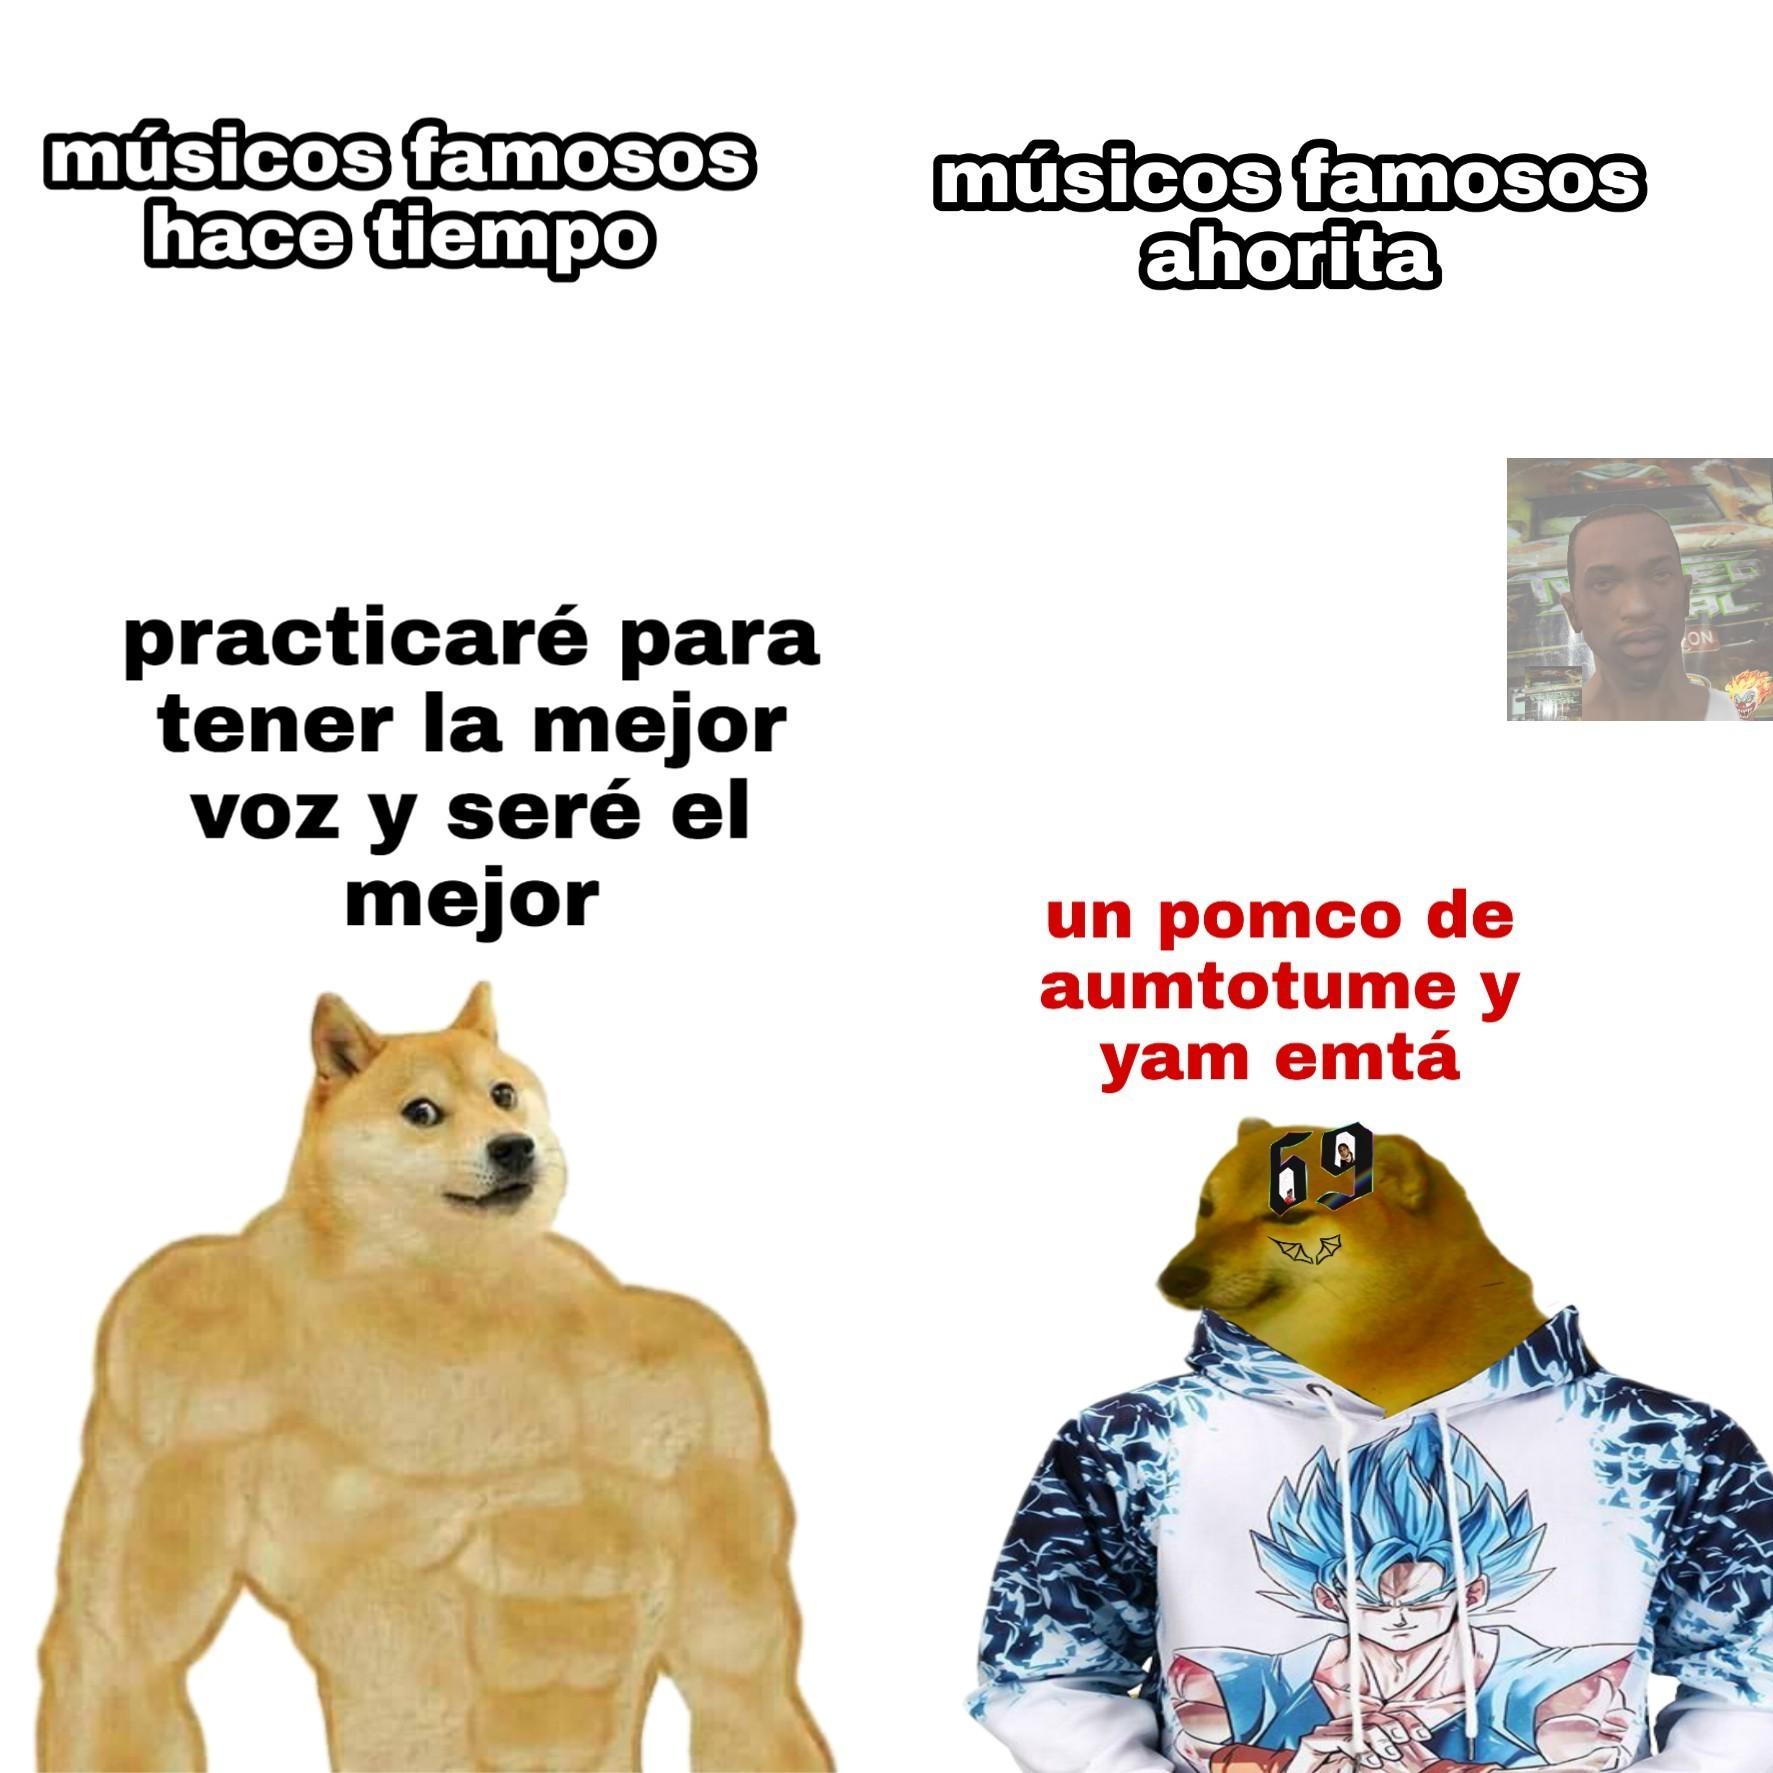 TE TRAJE FLORES - meme